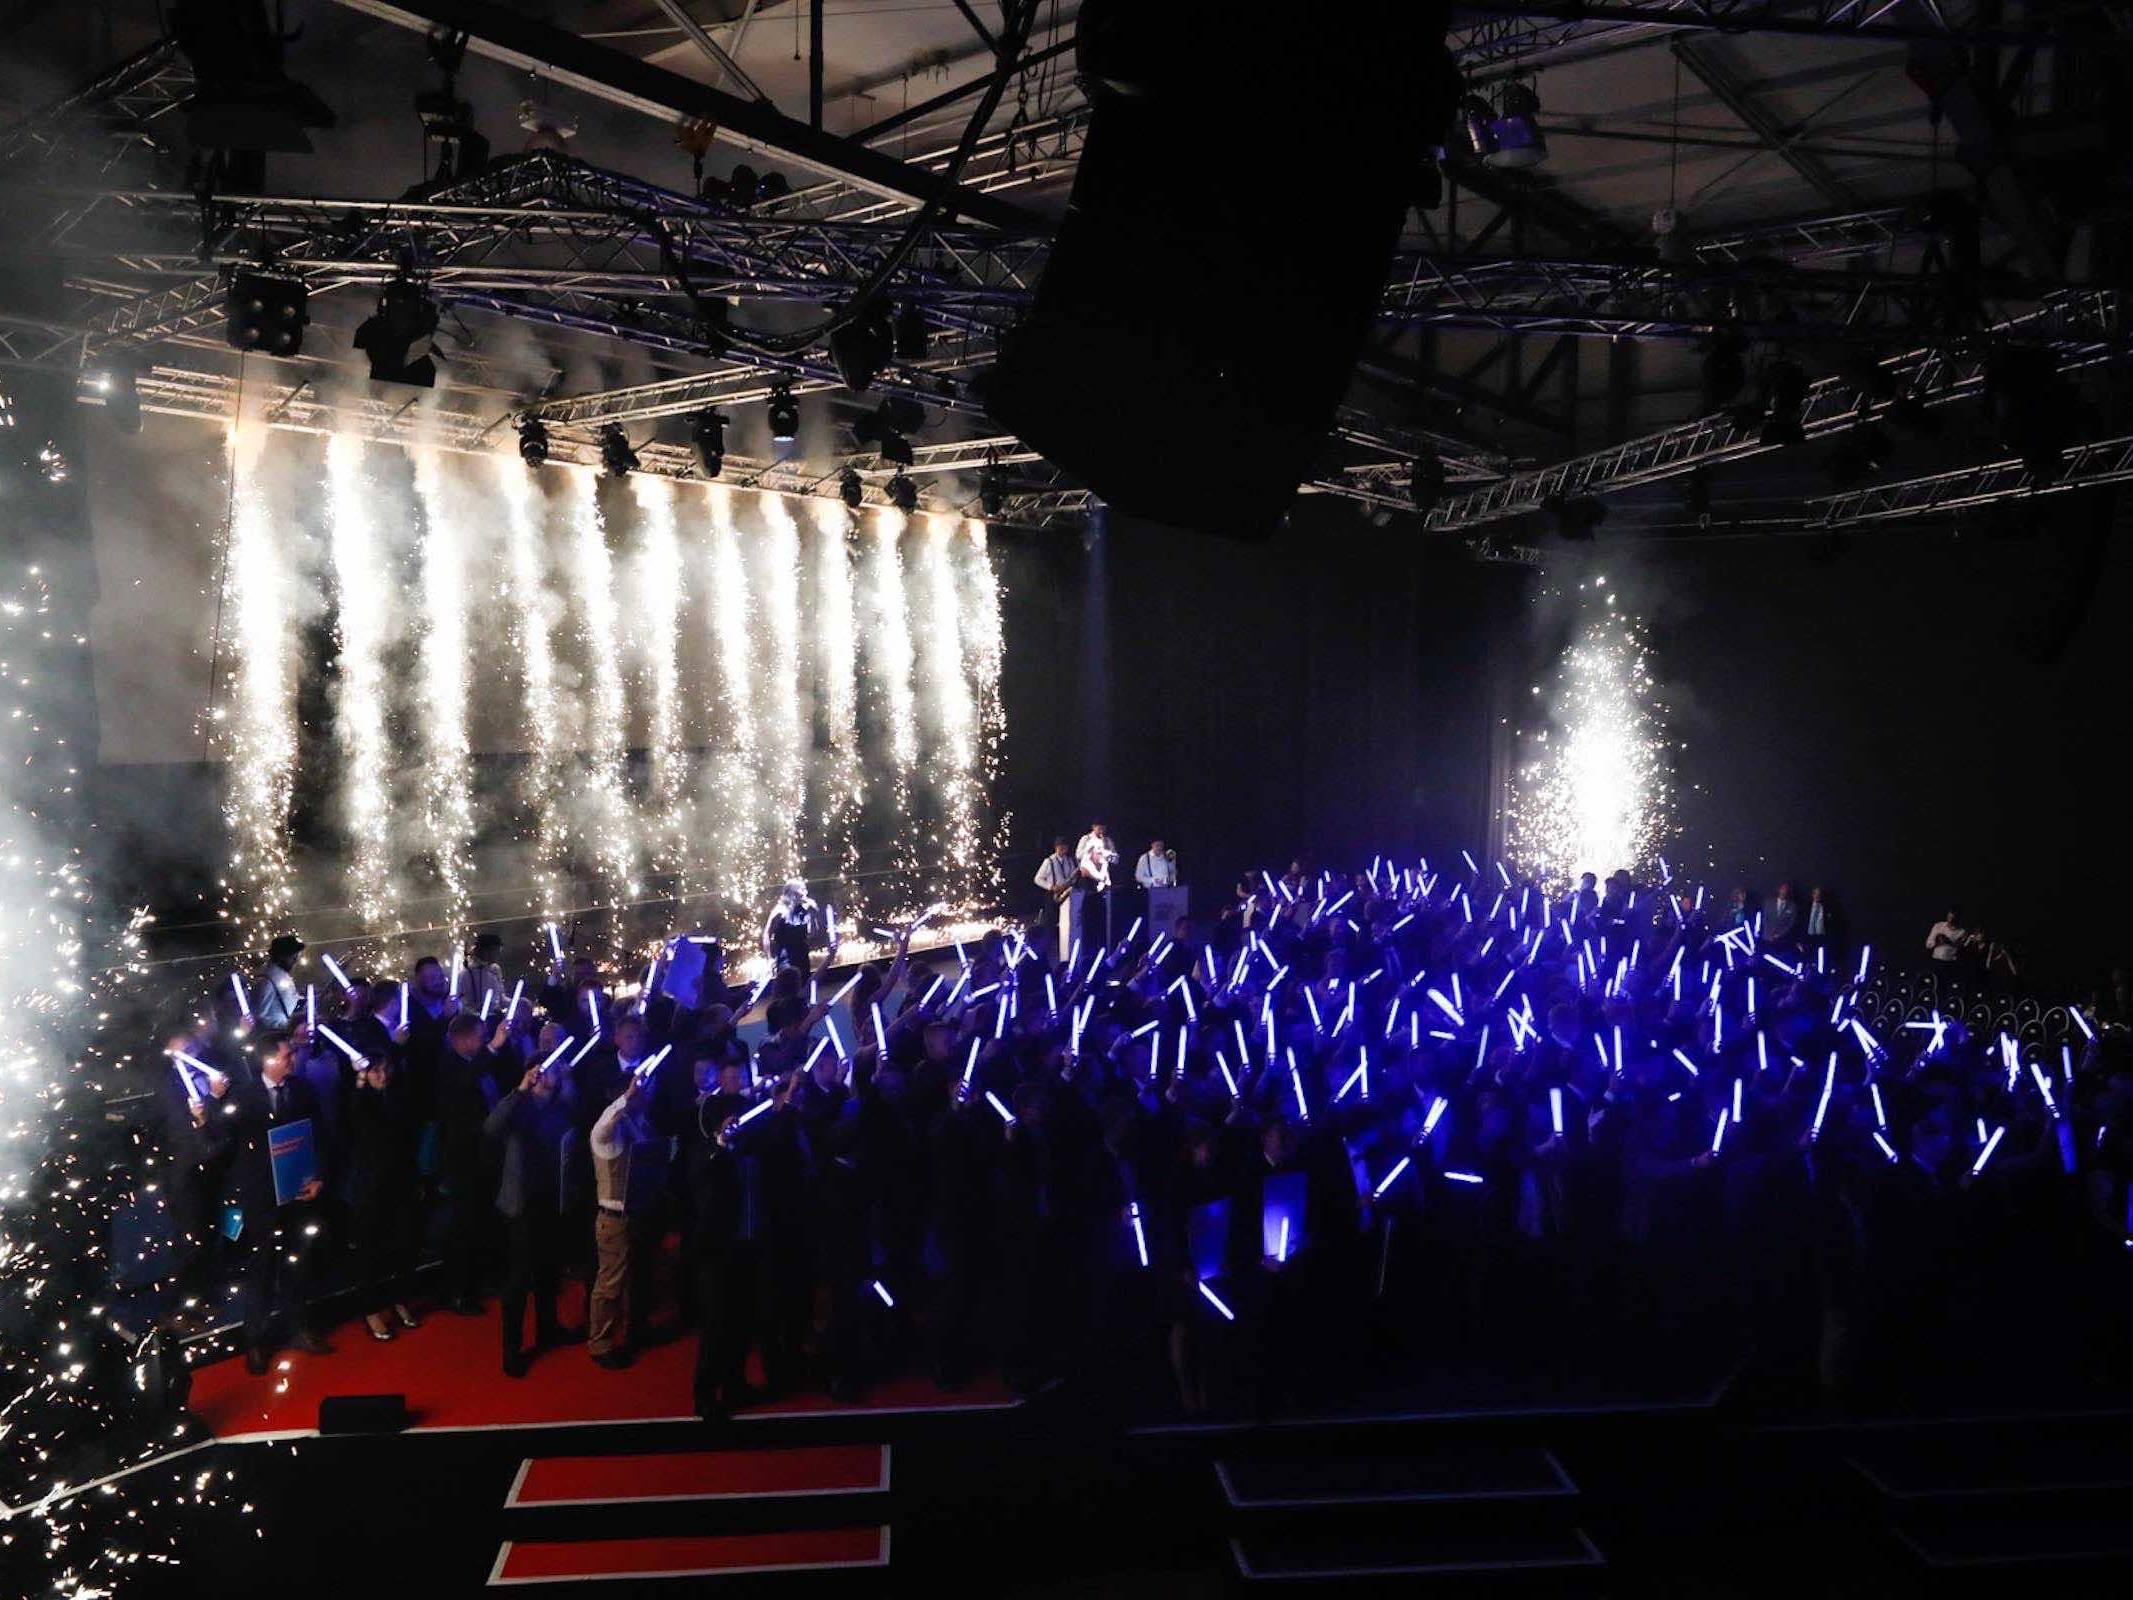 Band   Hamburg   Liveband   Livemusik   Walking   Act   Partyband   Jazzband   Swingband   Loungeband   Popband   Jazz   Saxophonist   Bühnenshow   Showband   Hochzeit   Messe   Firmenfeier   Charity   Gala   Hamburgfeiert